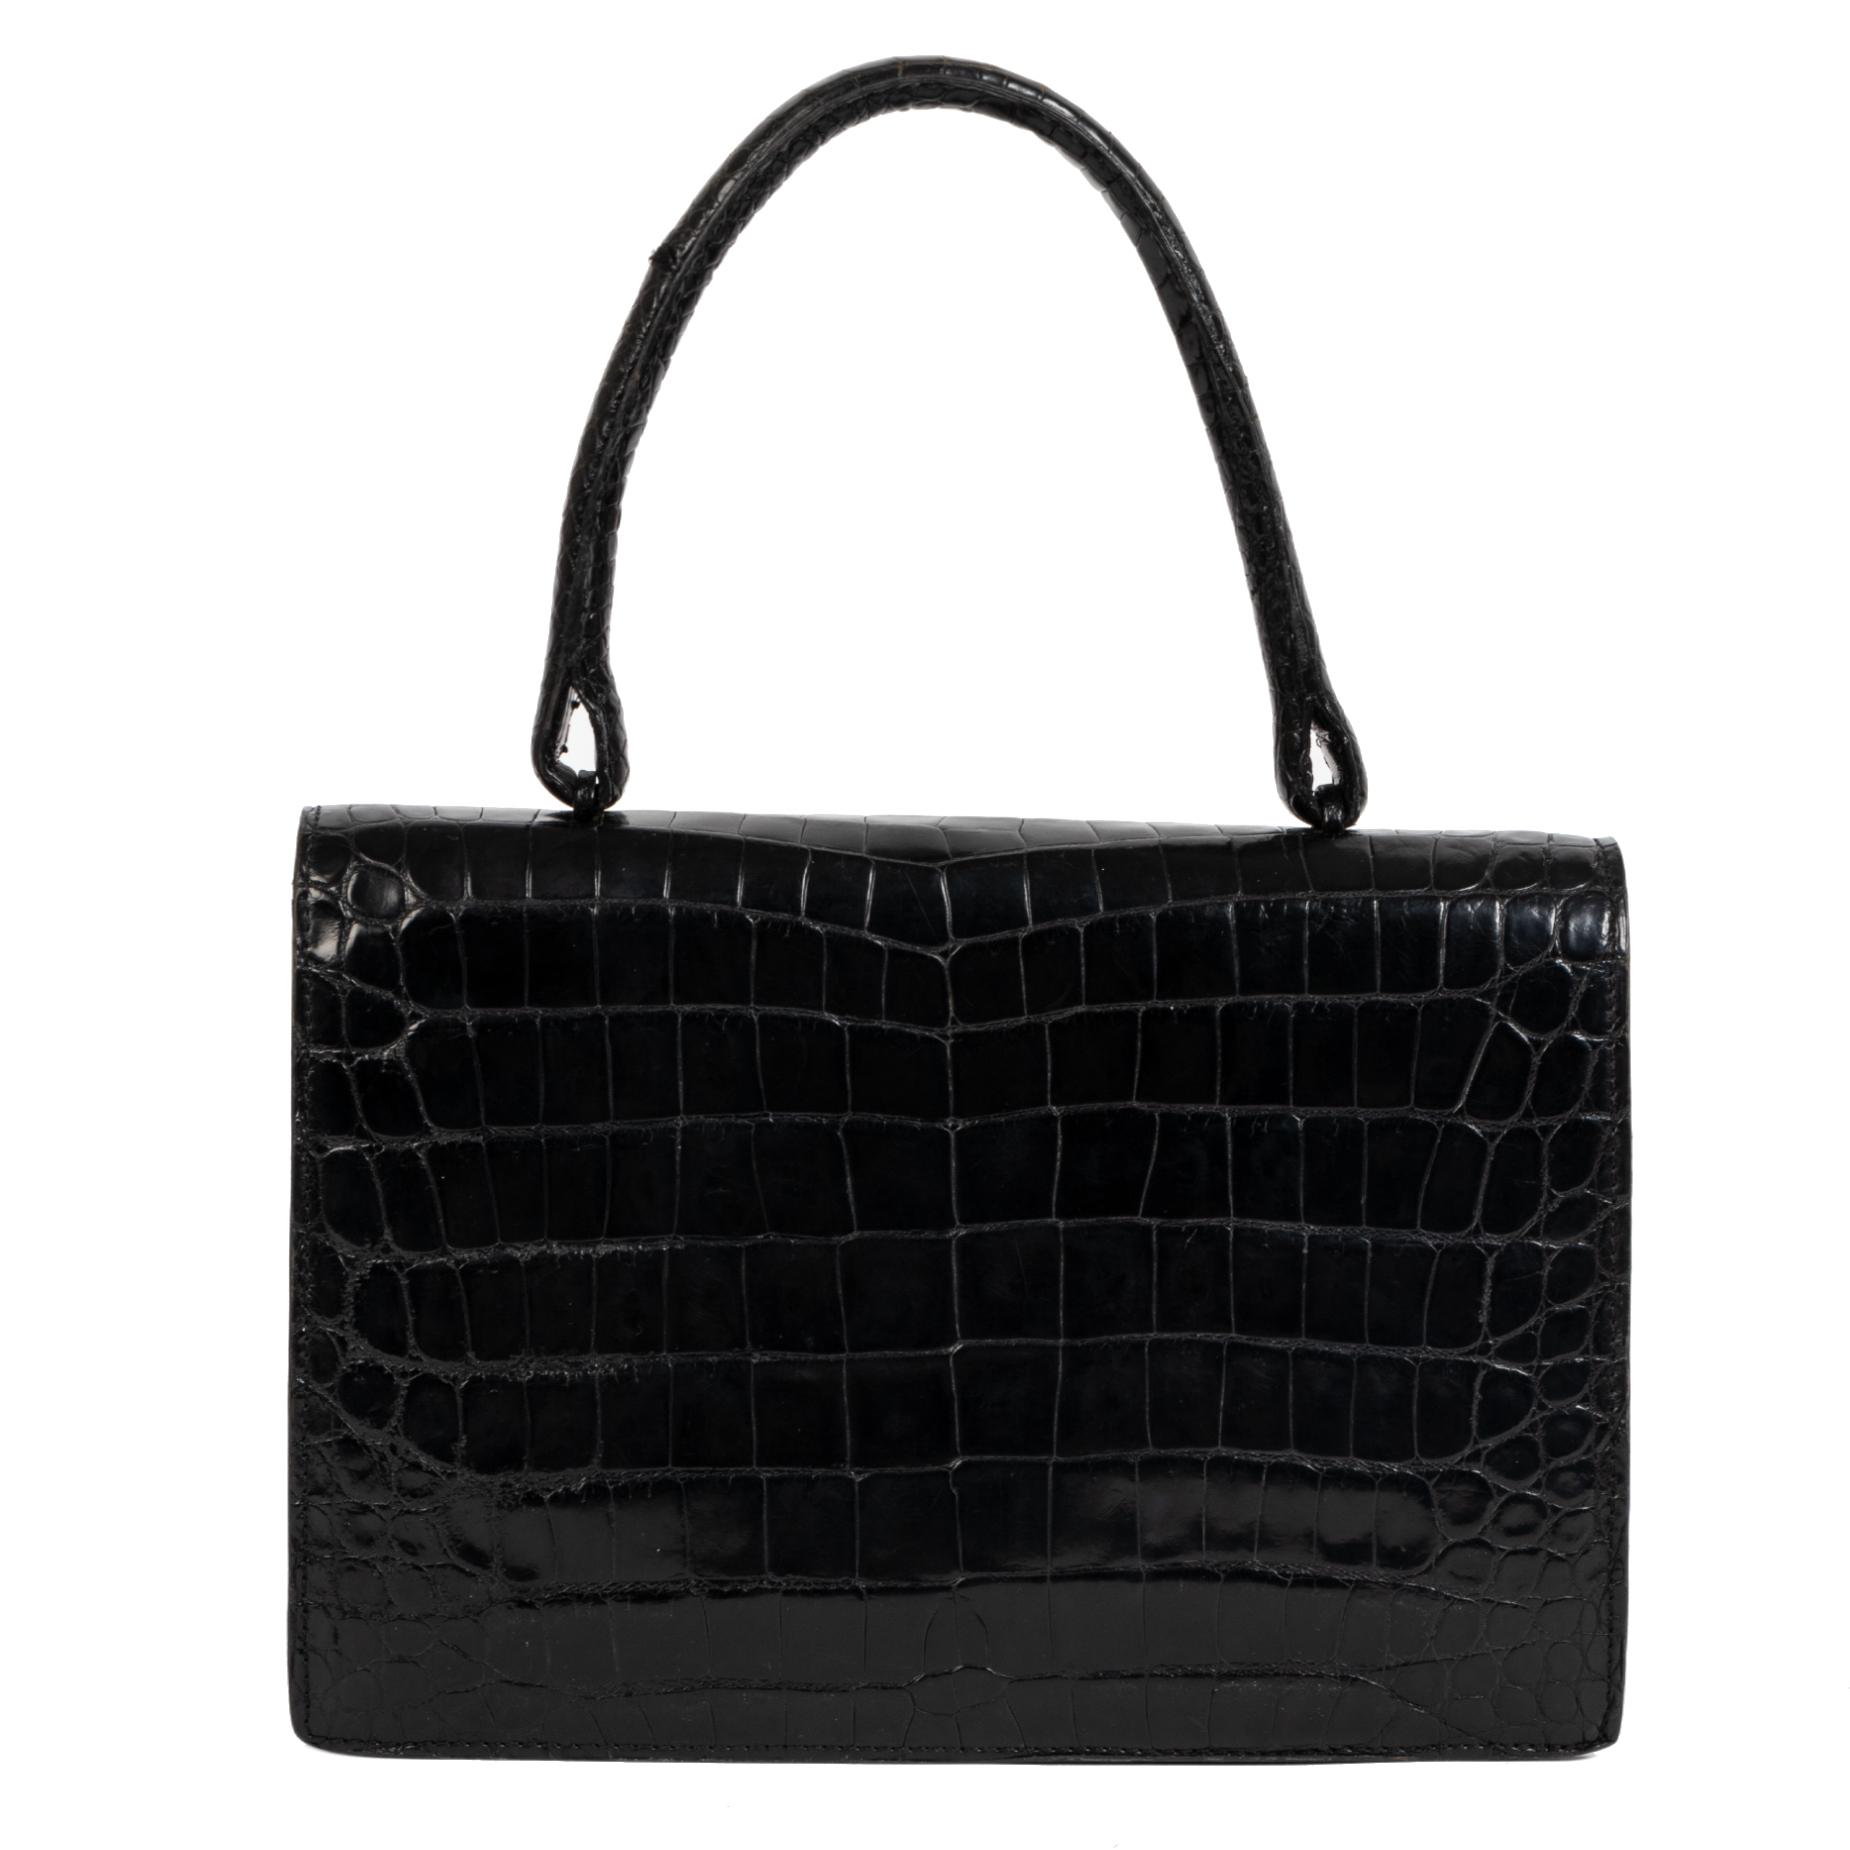 Authentic secondhand Delvaux Black Vintage Crocodile Top Handle Bag designer bags luxury vintage webshop safe secure online shopping designer brands worldwide shipping fashion